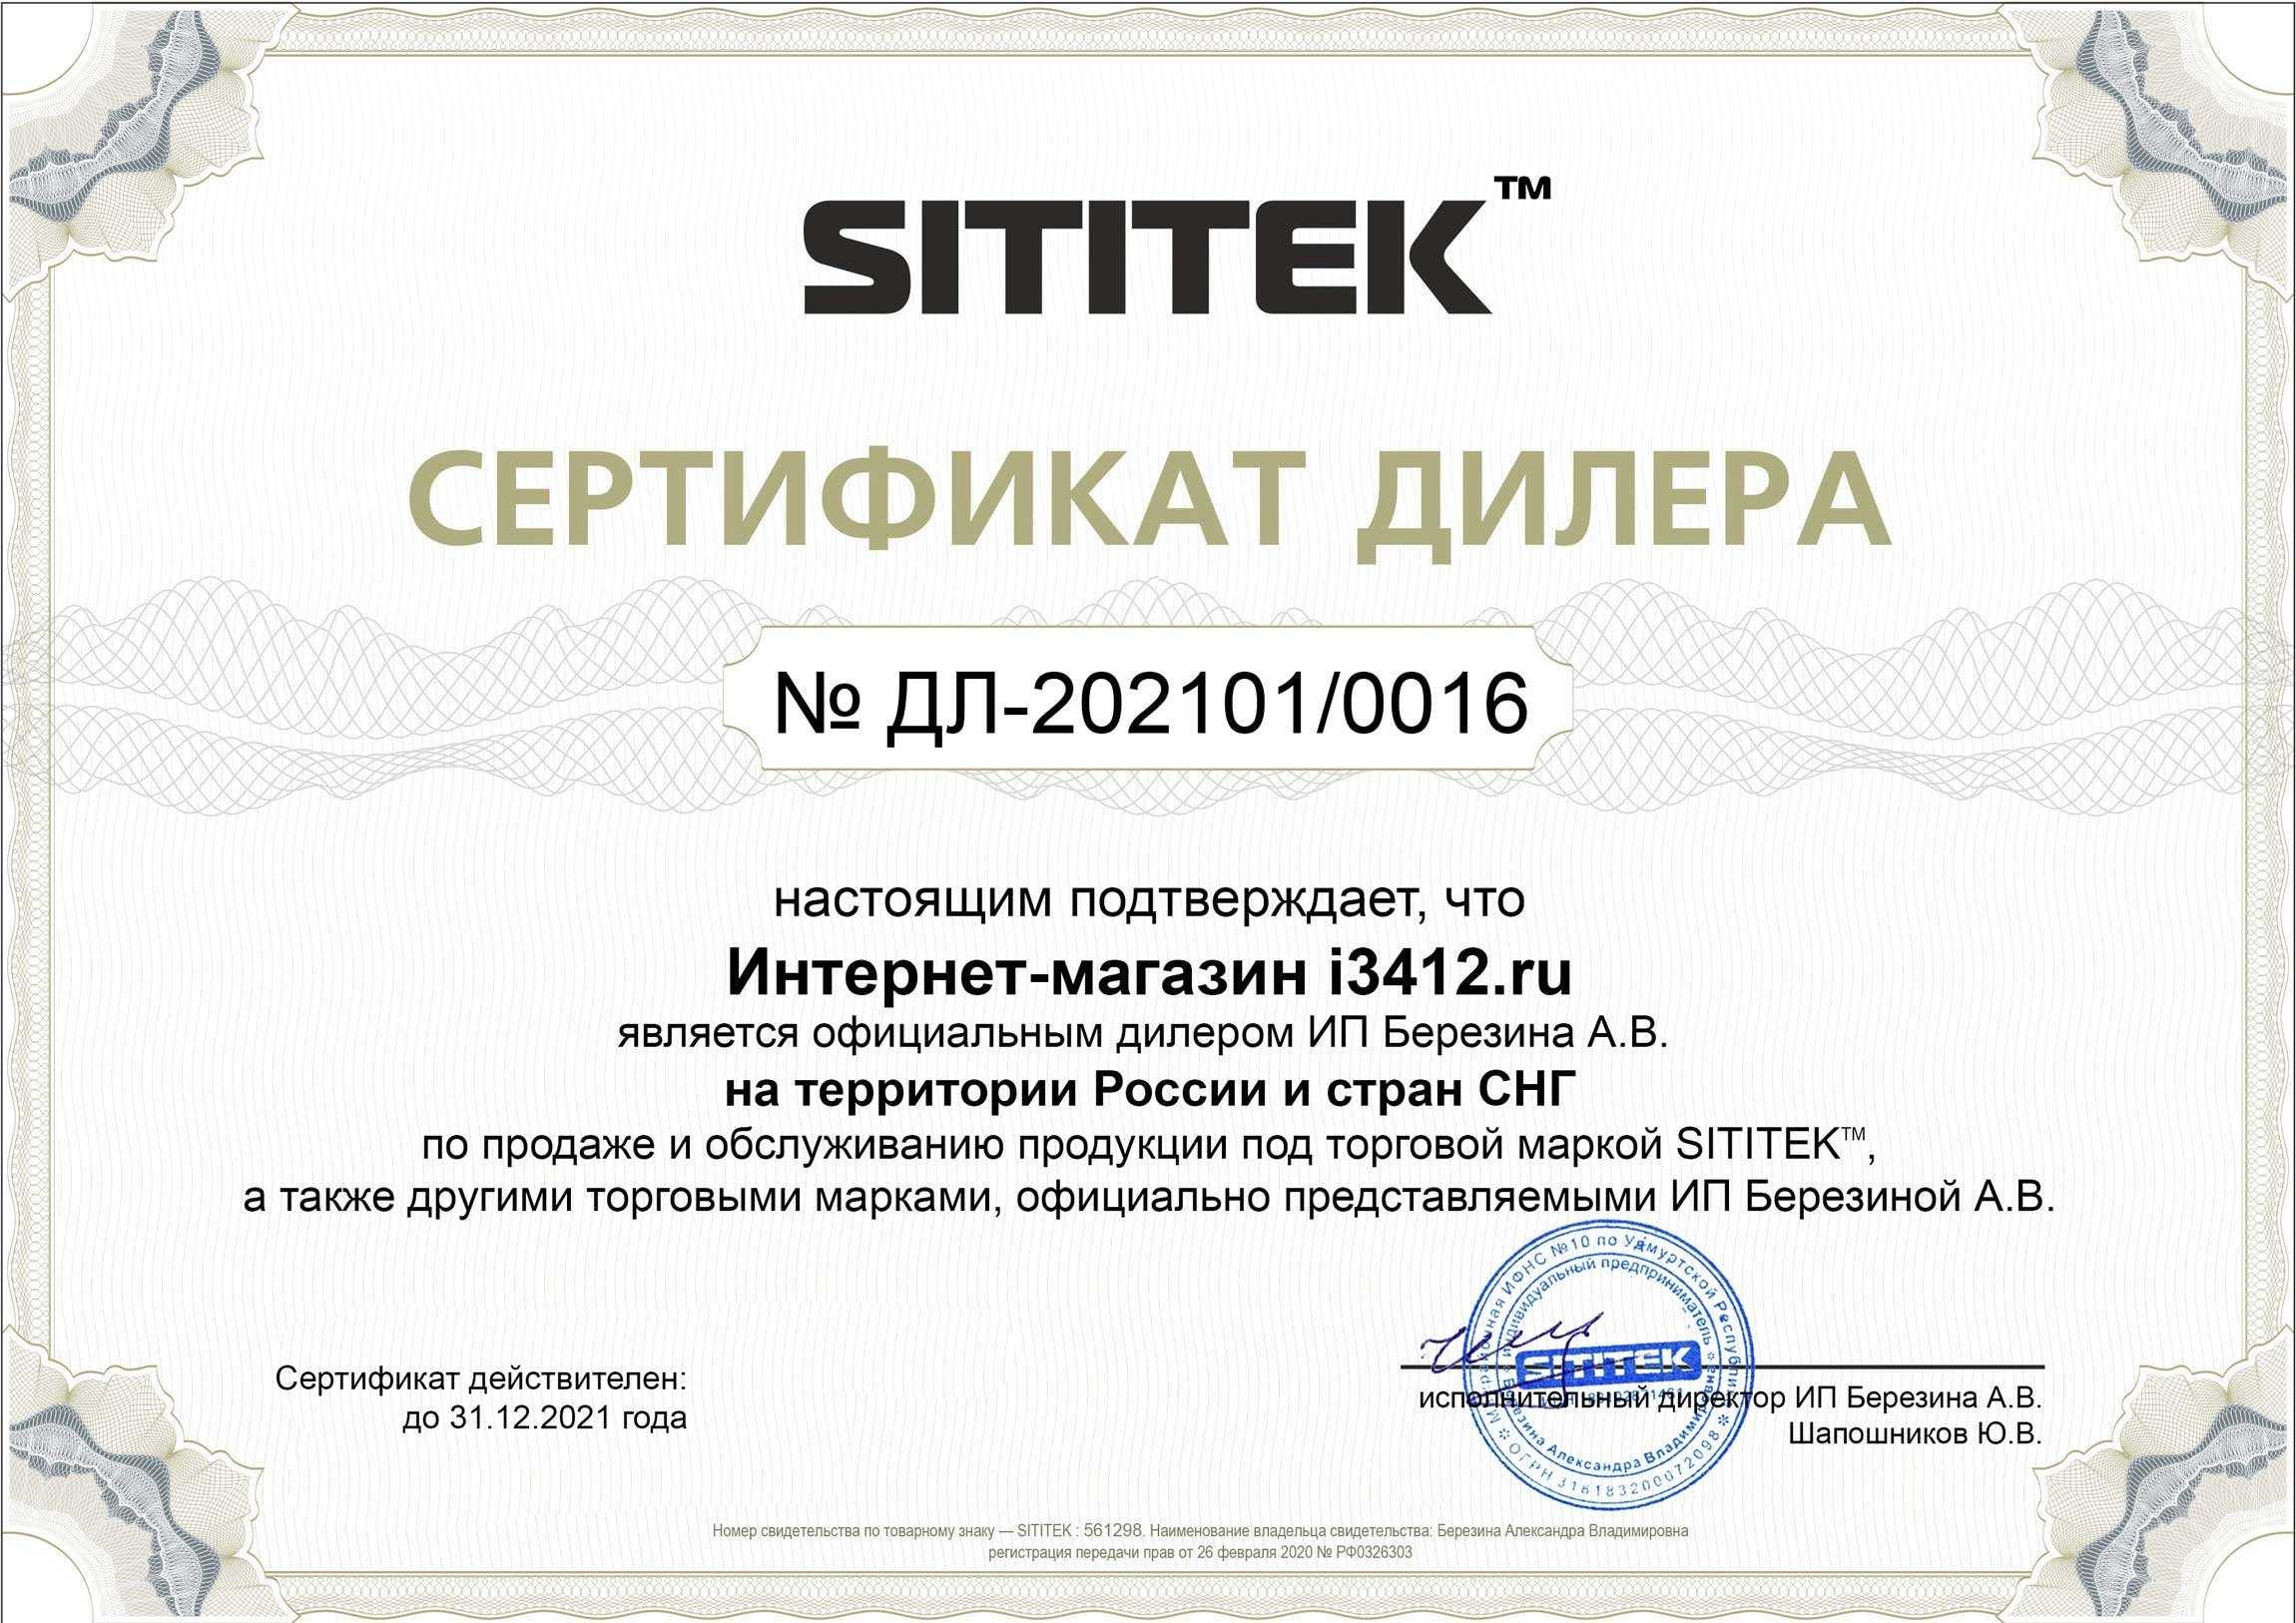 Сертификат дилера на право реализации и обслуживания продукции ТМ